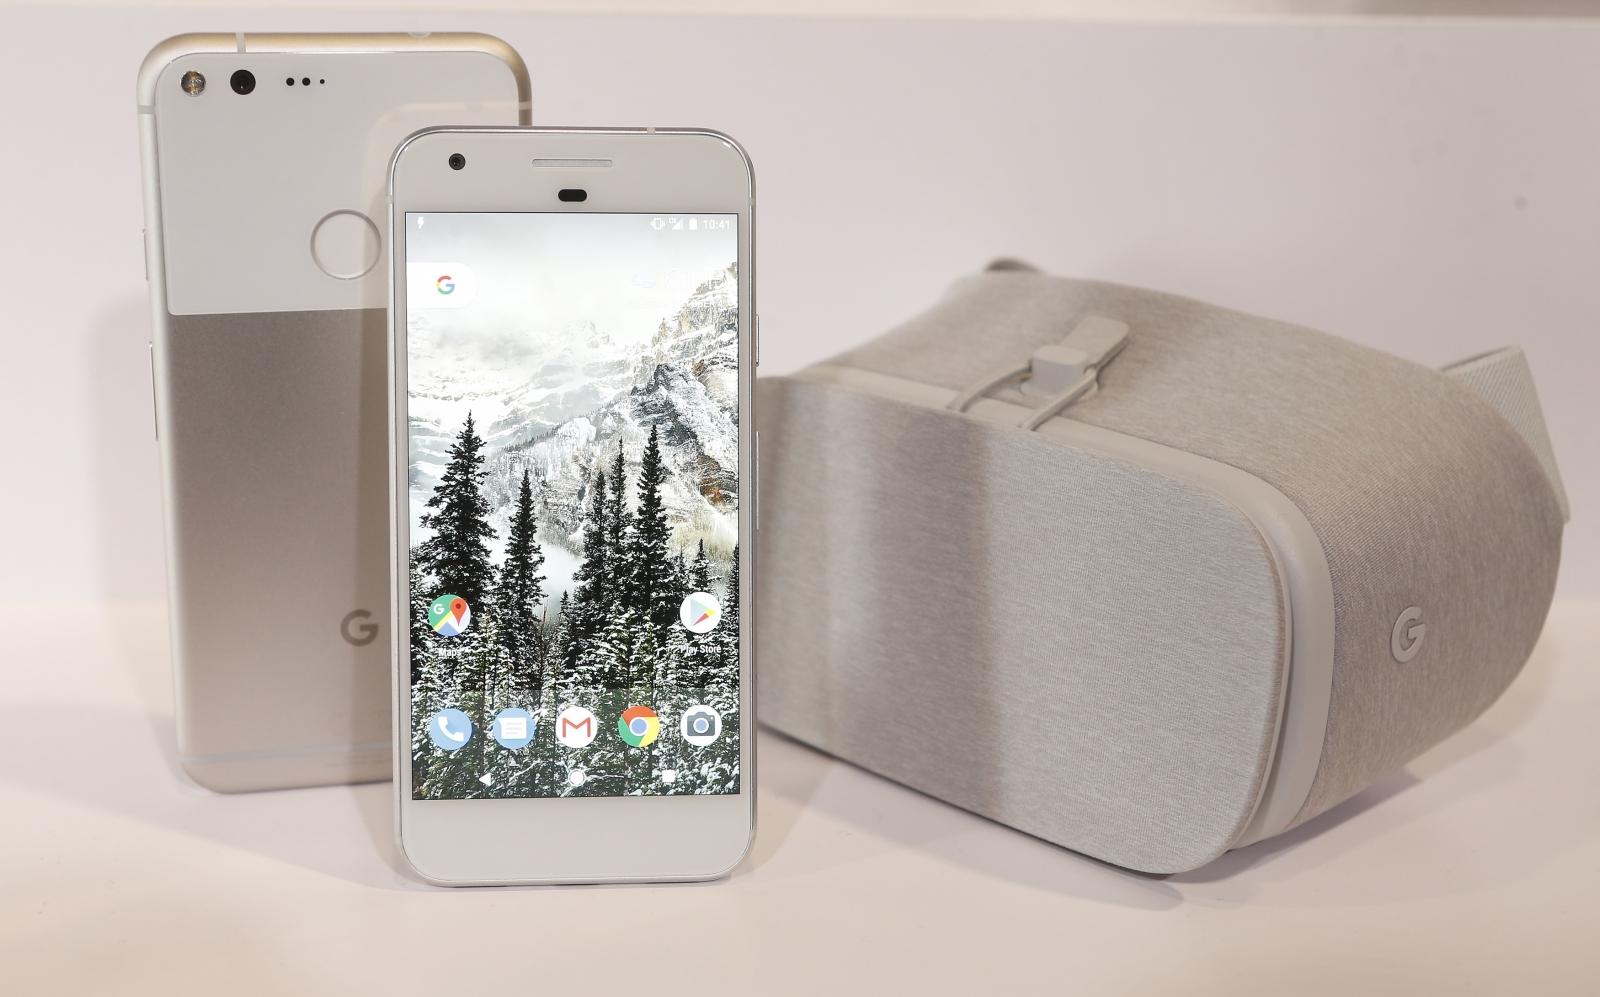 Pixel phones to generate $3.8bn revenue